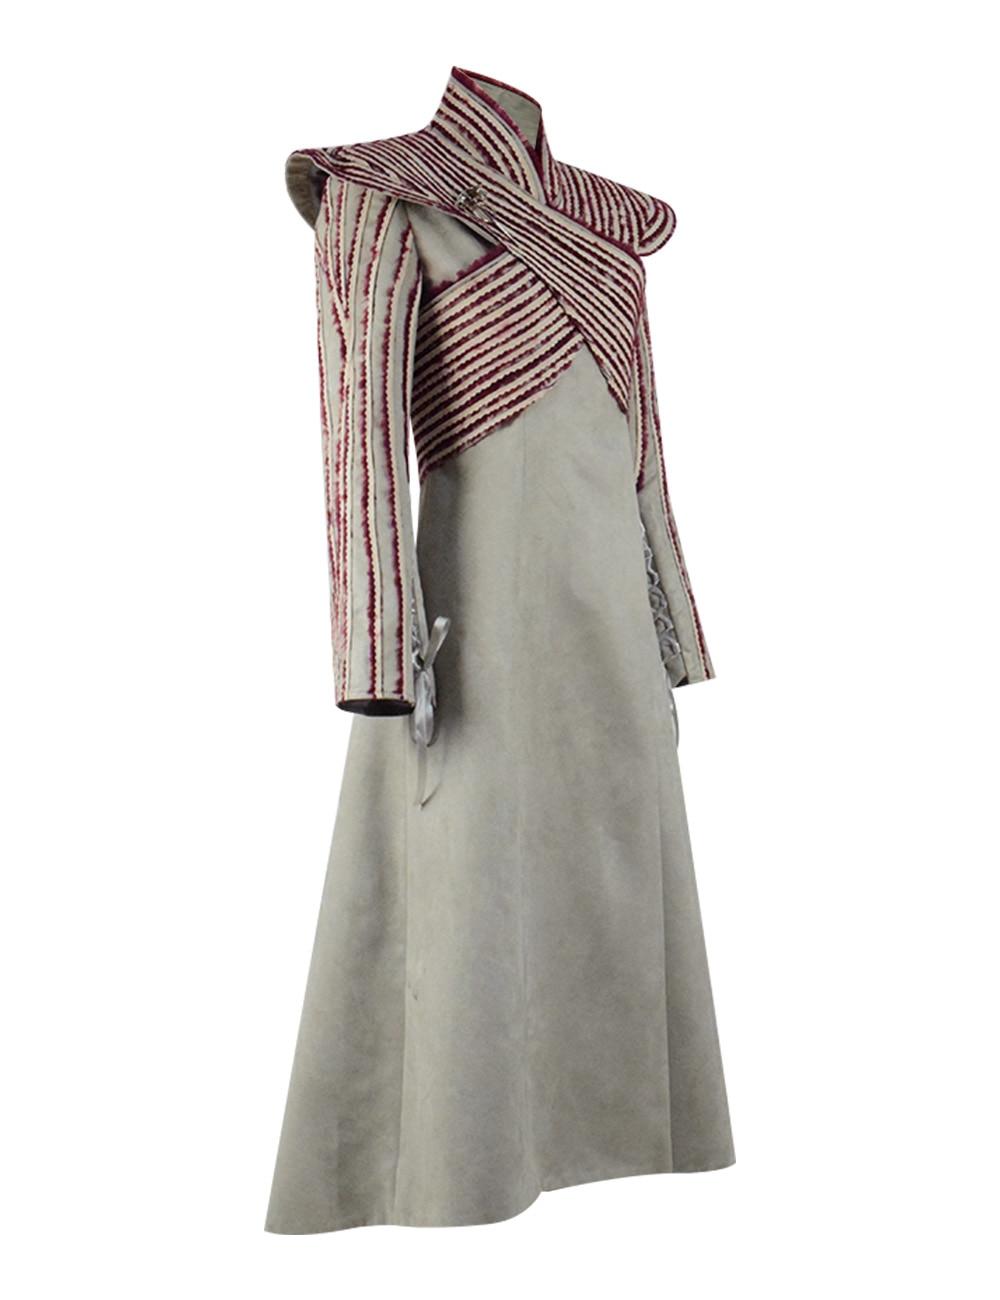 Cosdaddy Daenerys Targaryen Cosplay Costume Women Winter Dress Coat Long Jacket Gown With Cape Halloween Party Costume